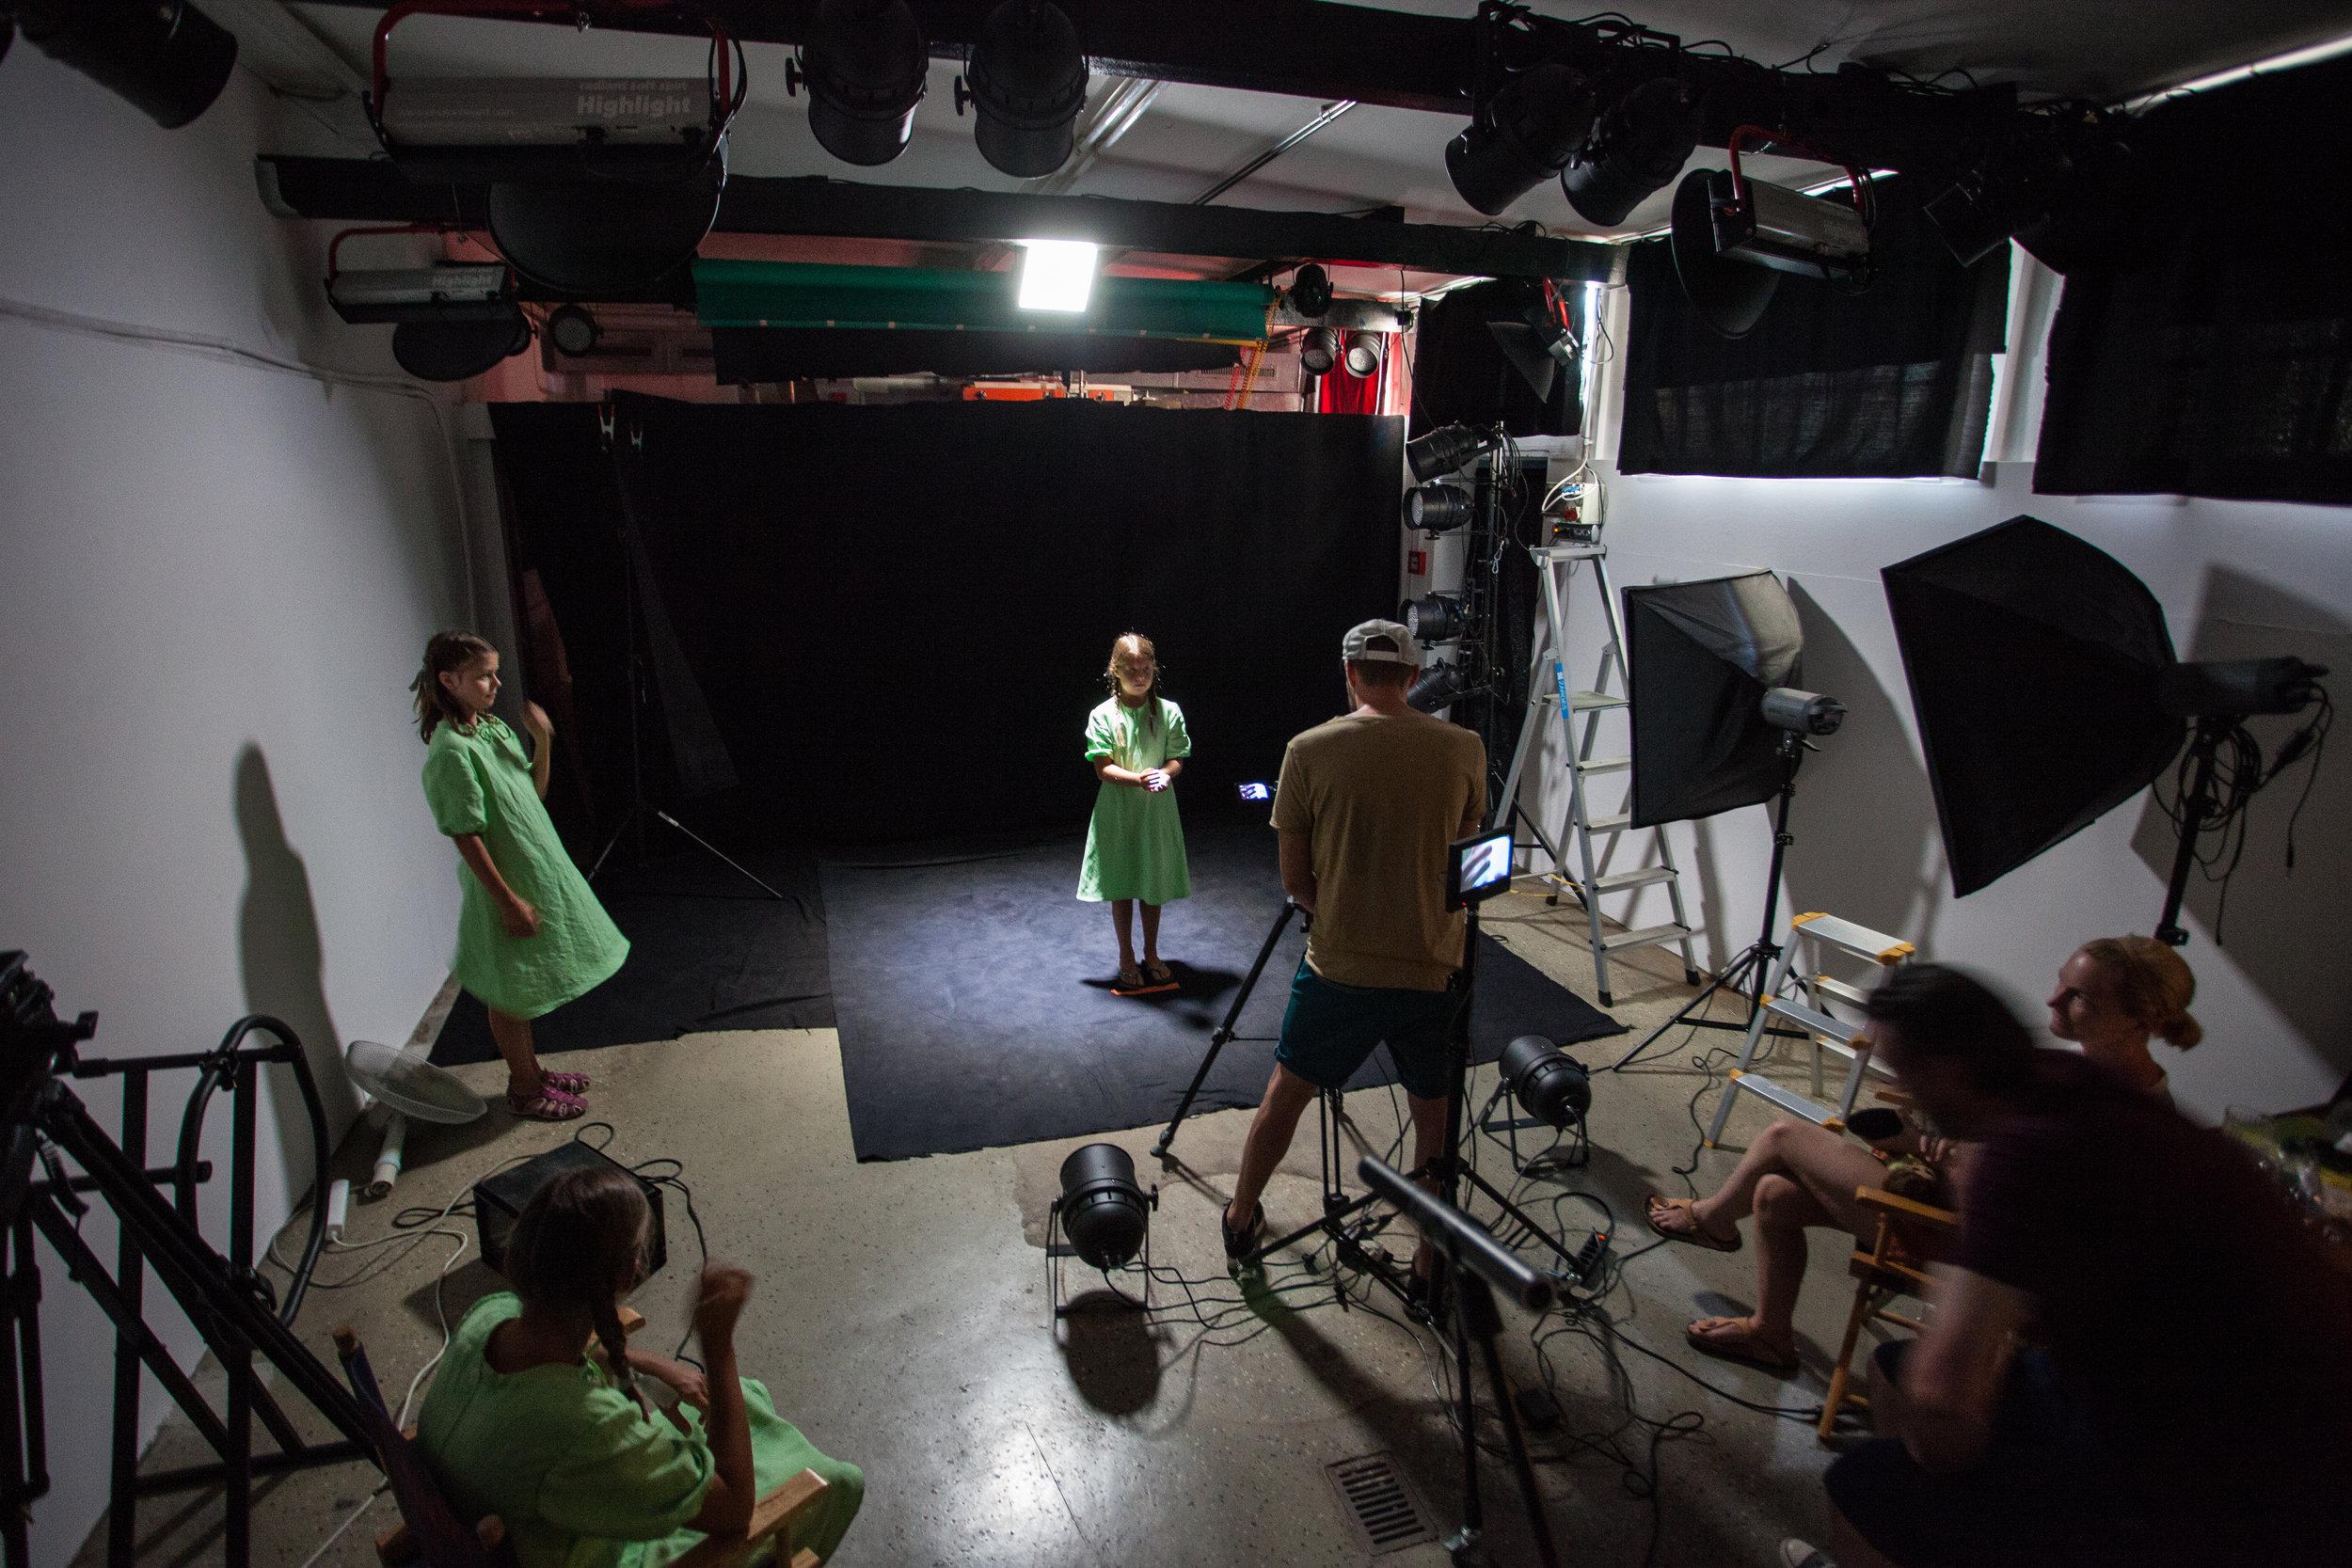 Dreharbeiten in unserem Studio 1